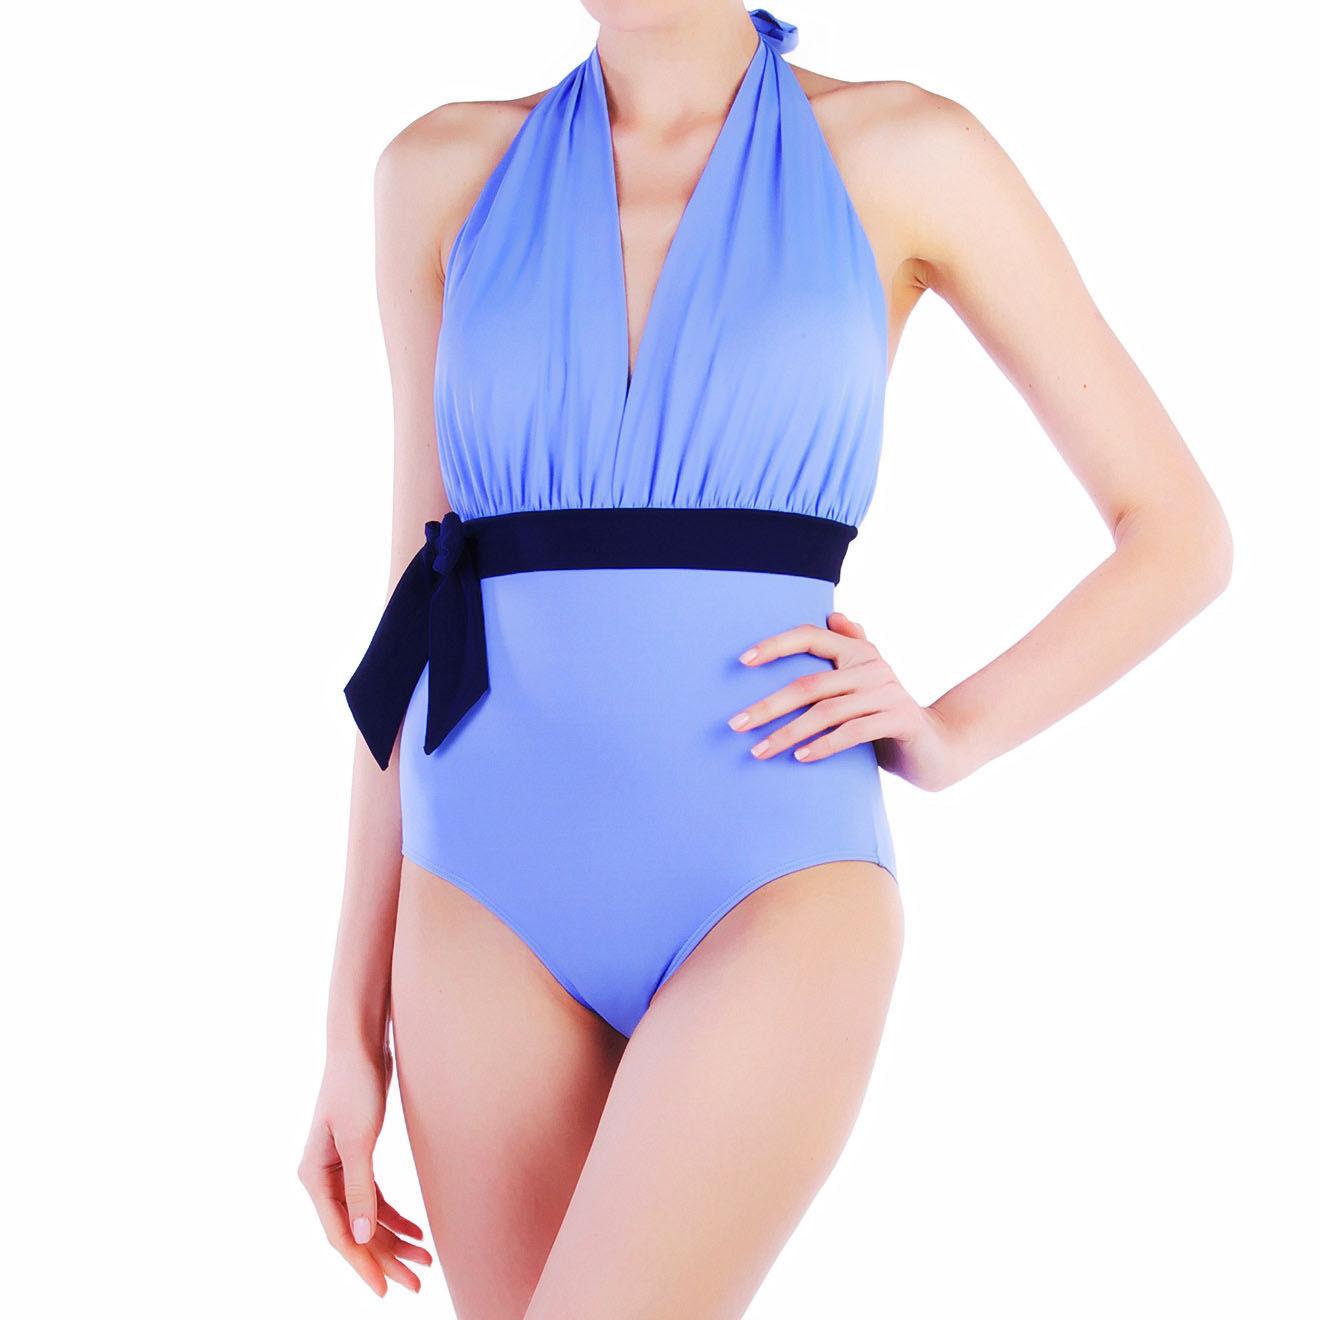 Maillot de bain 1 Pièce Danielle bleu provence/bleu marine